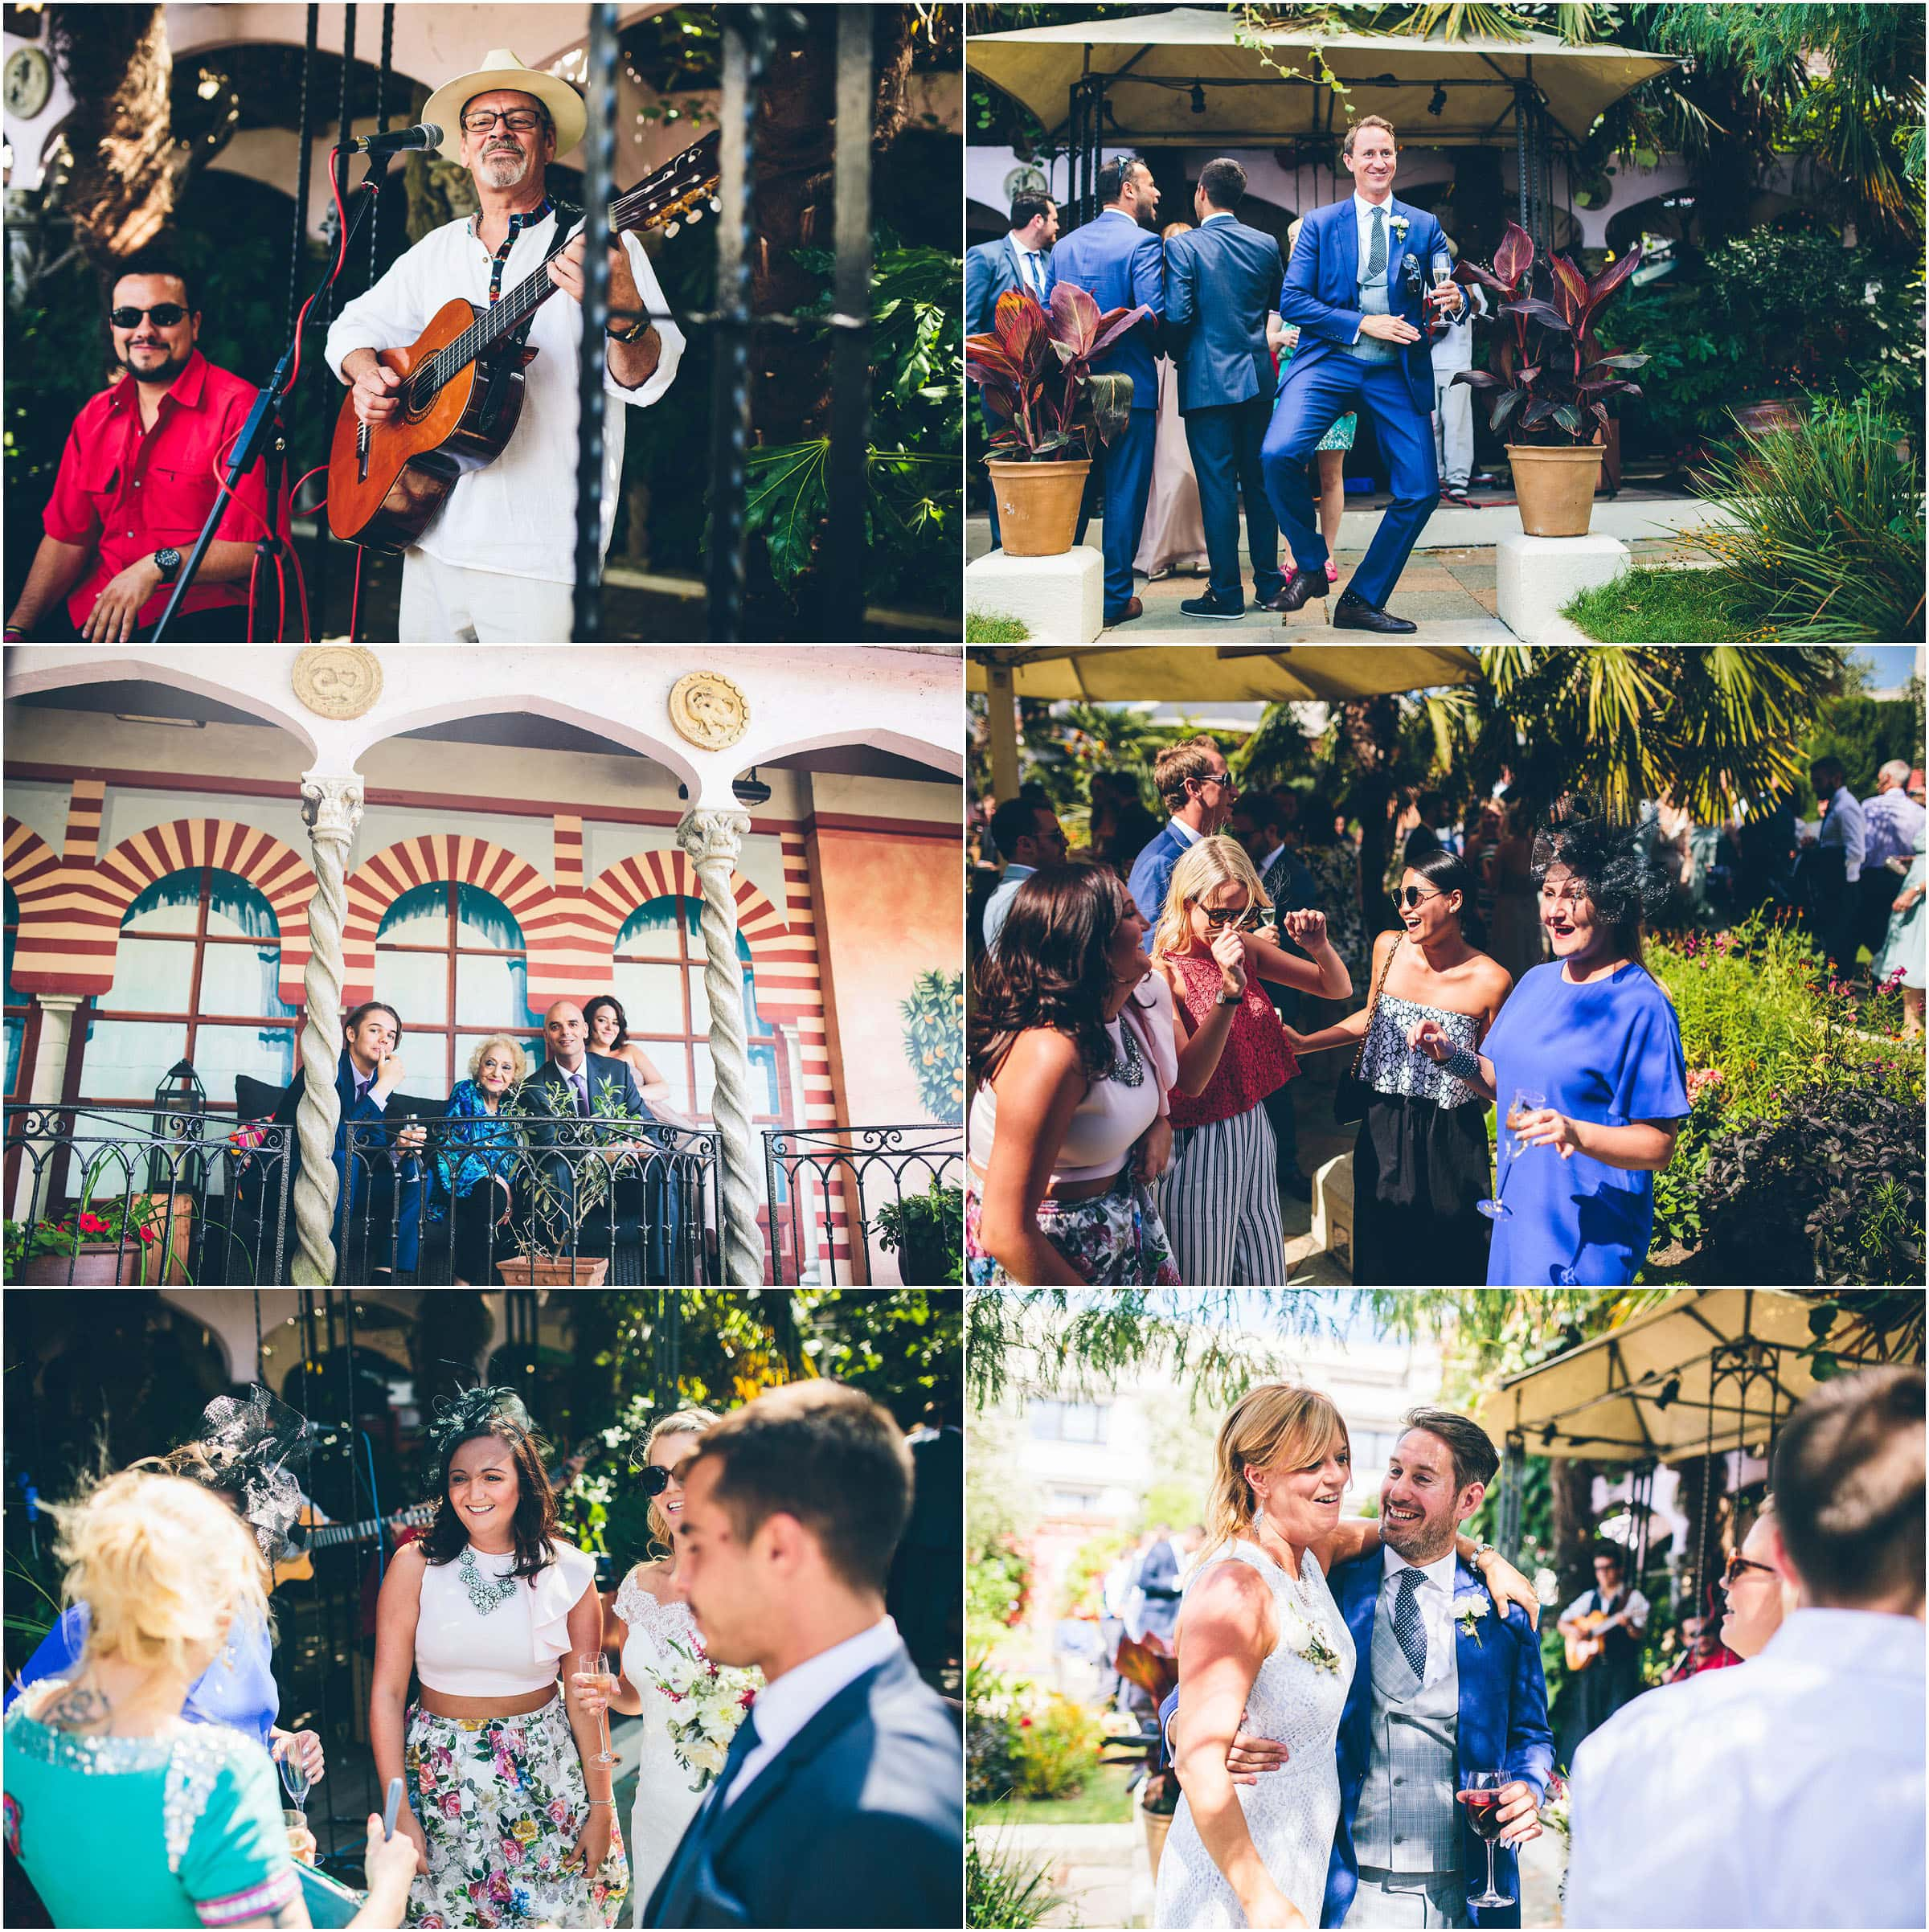 Kensington_Roof_Gardens_Wedding_Photography_0050